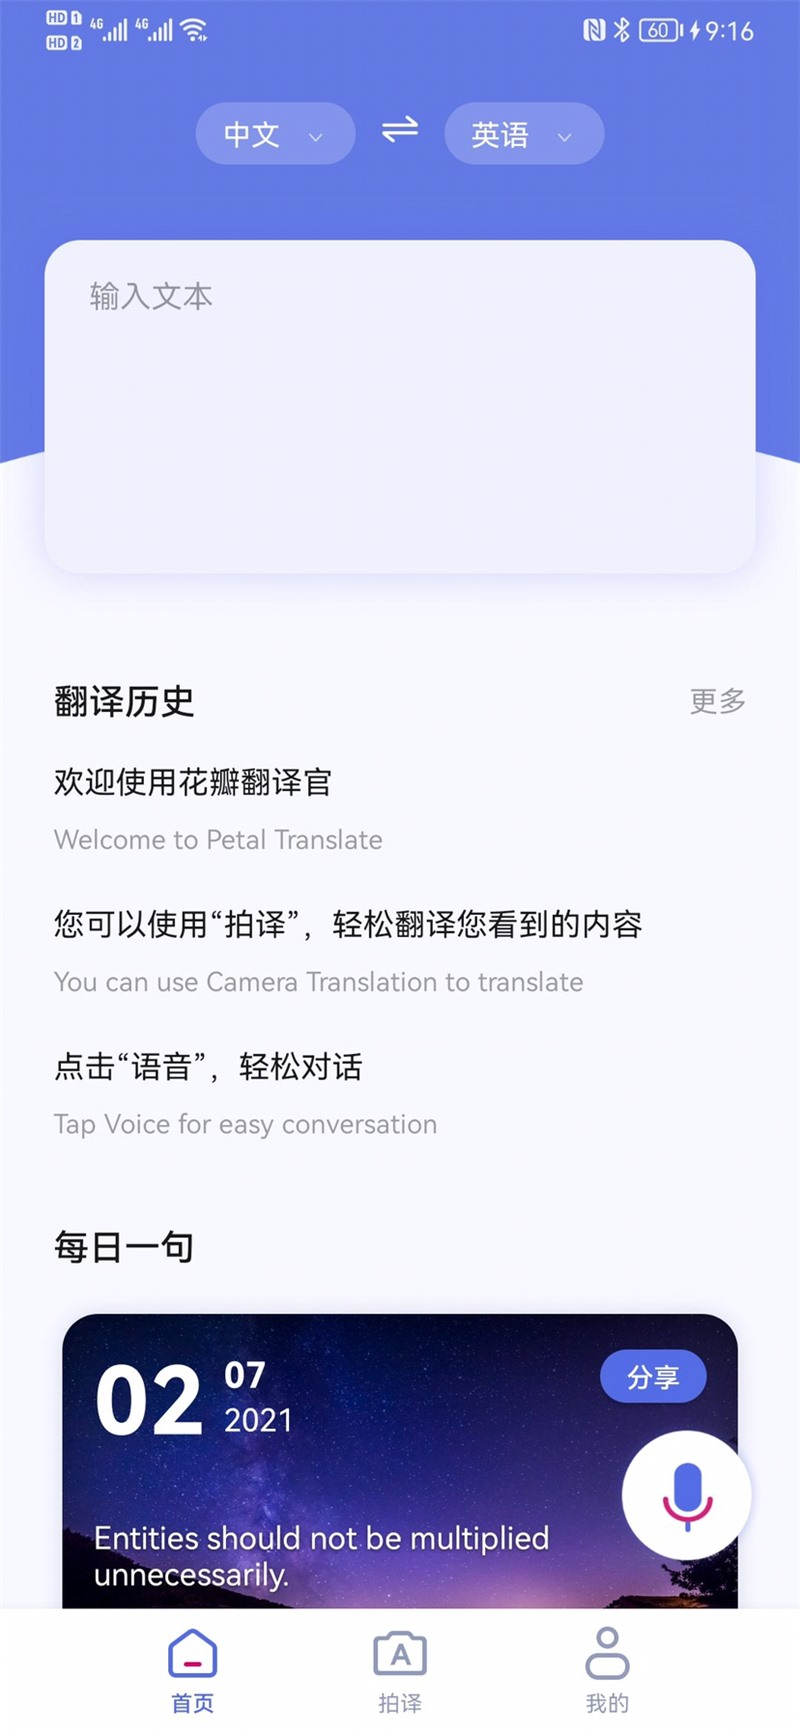 Huawei Petal Translate App